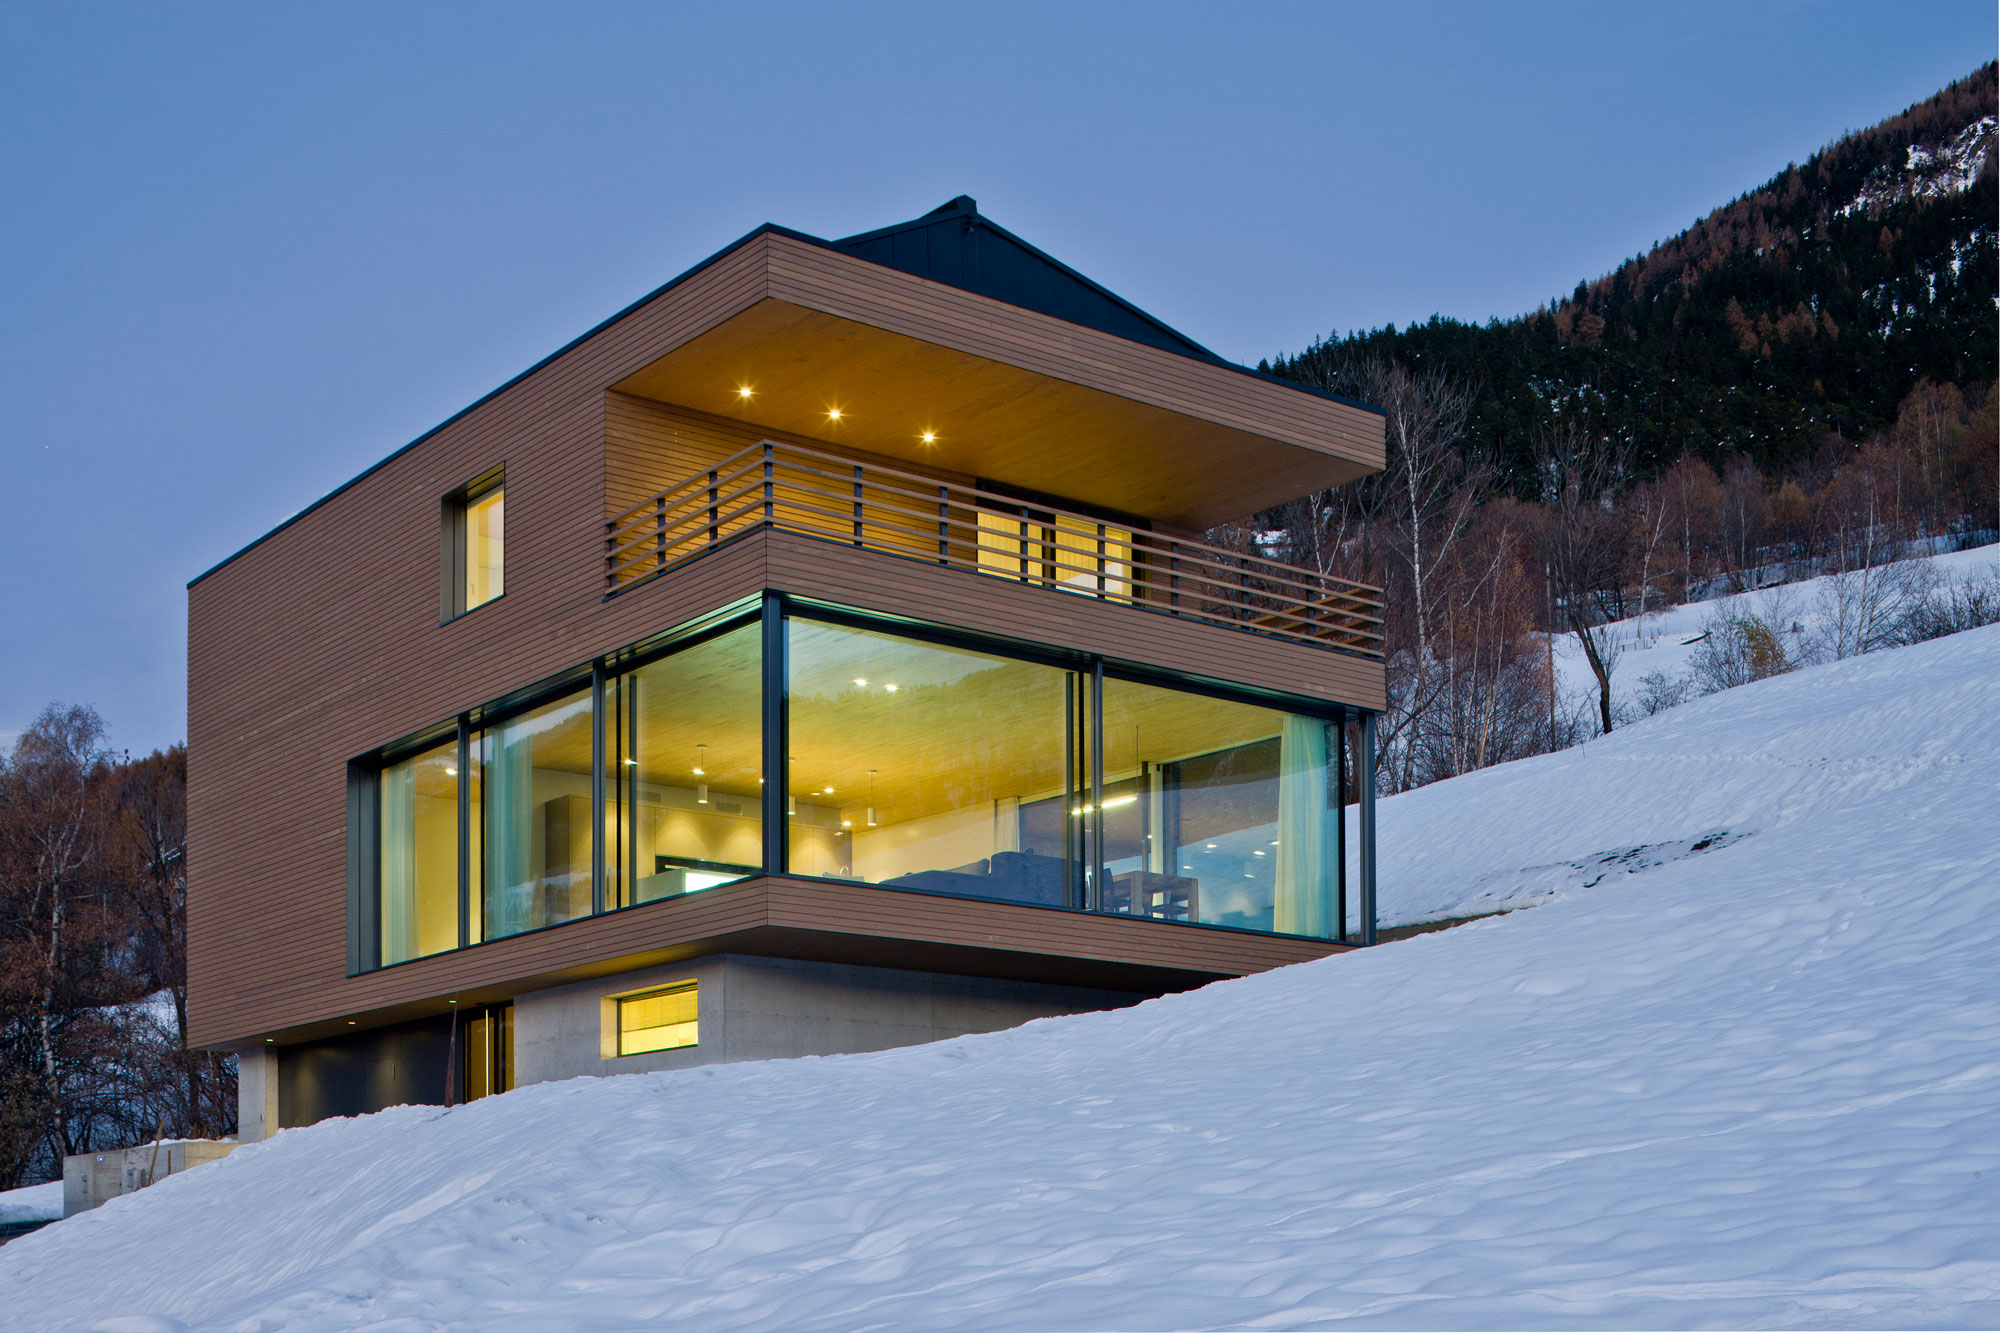 A HI-MACS House In Termen by Zeiter Berchtold-21